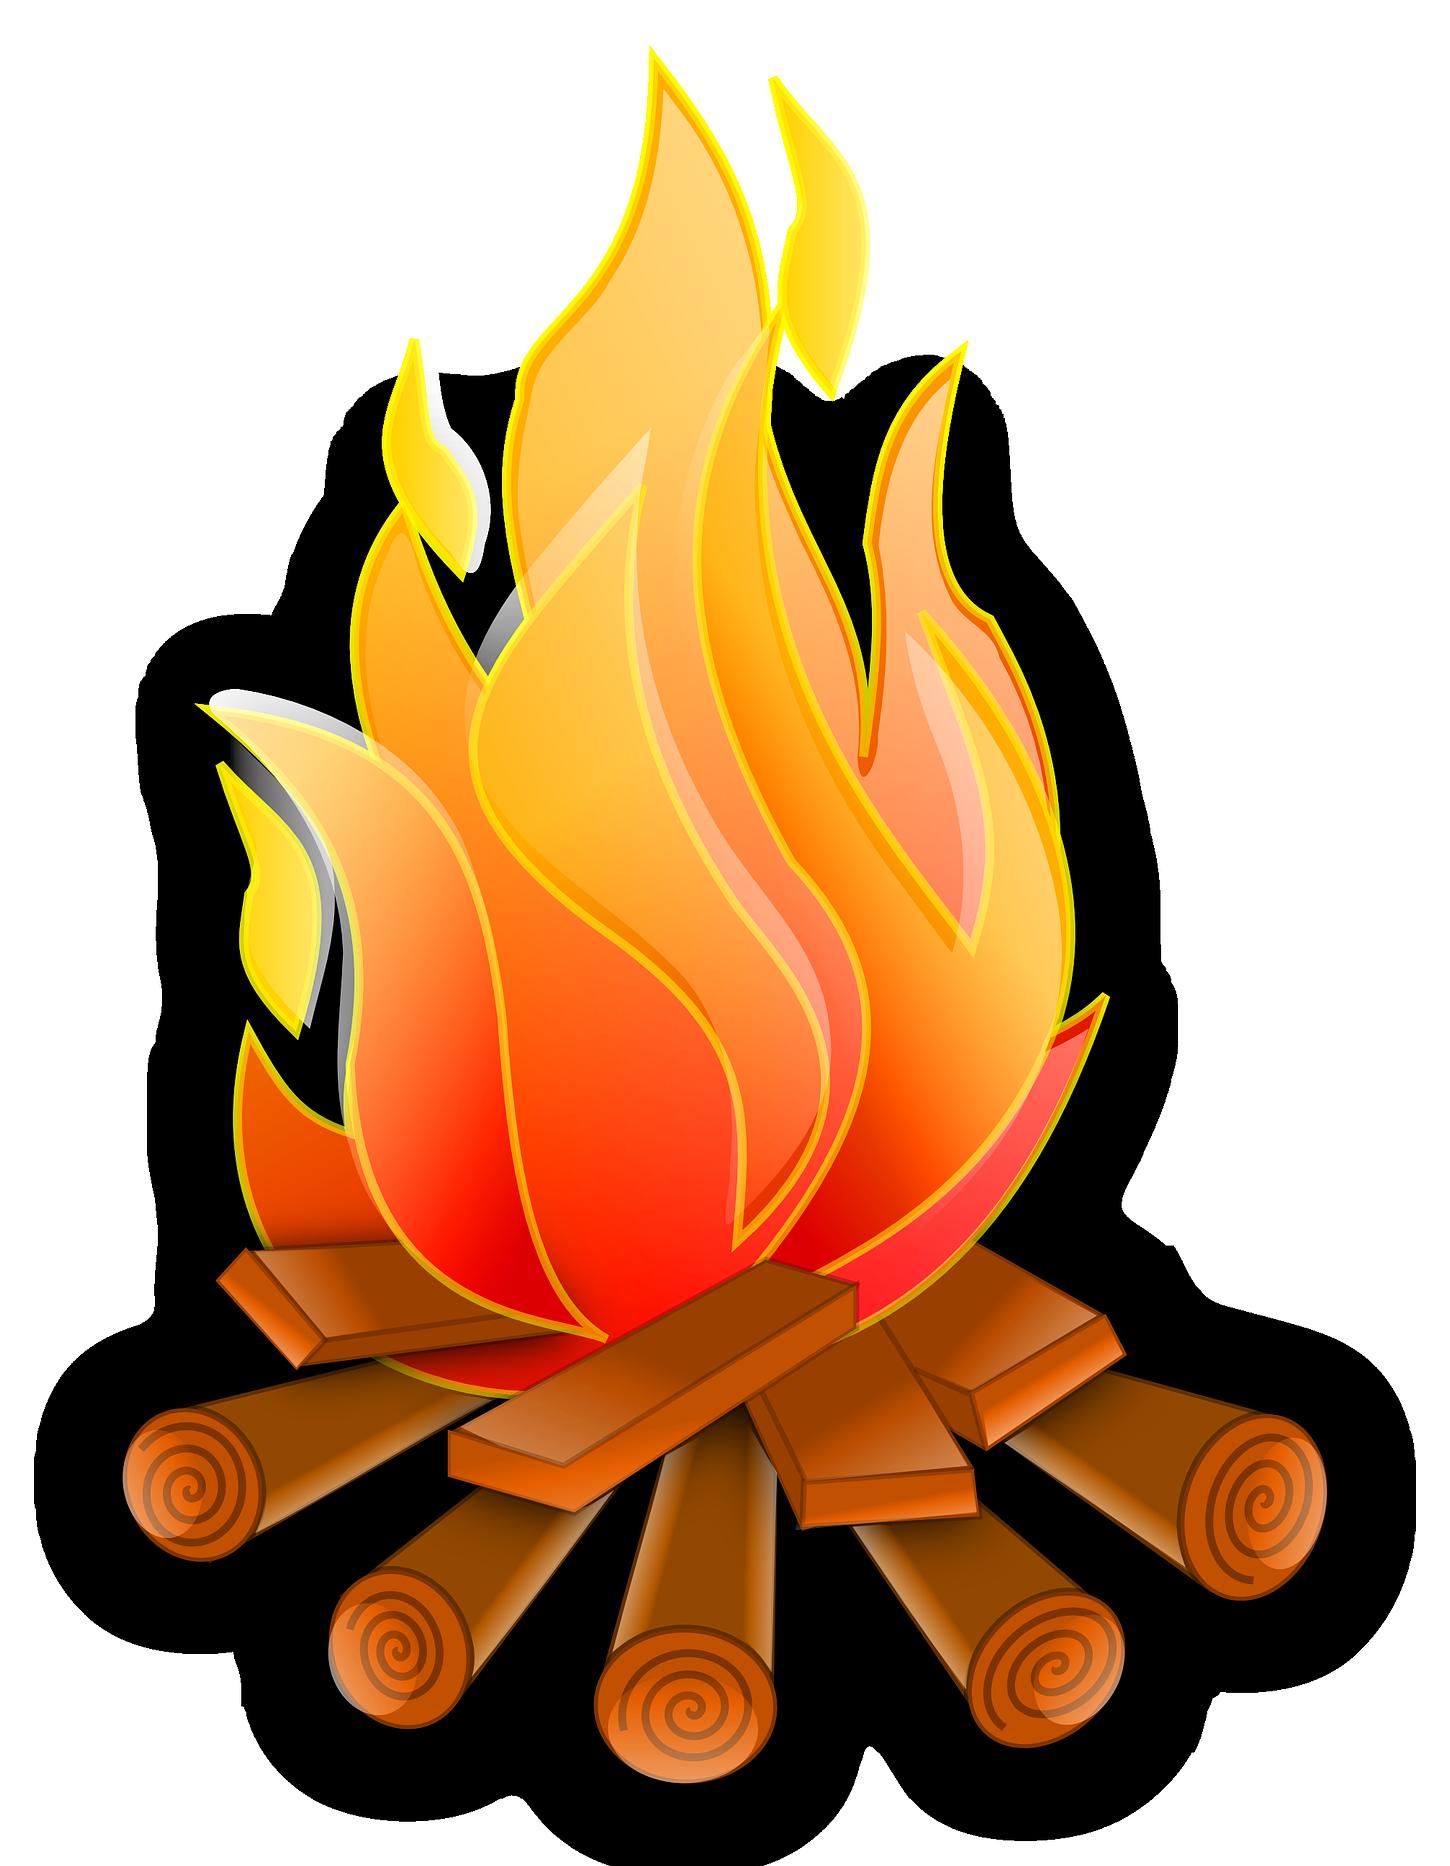 Bonfire clipart backyard bonfire. Painting art illustration